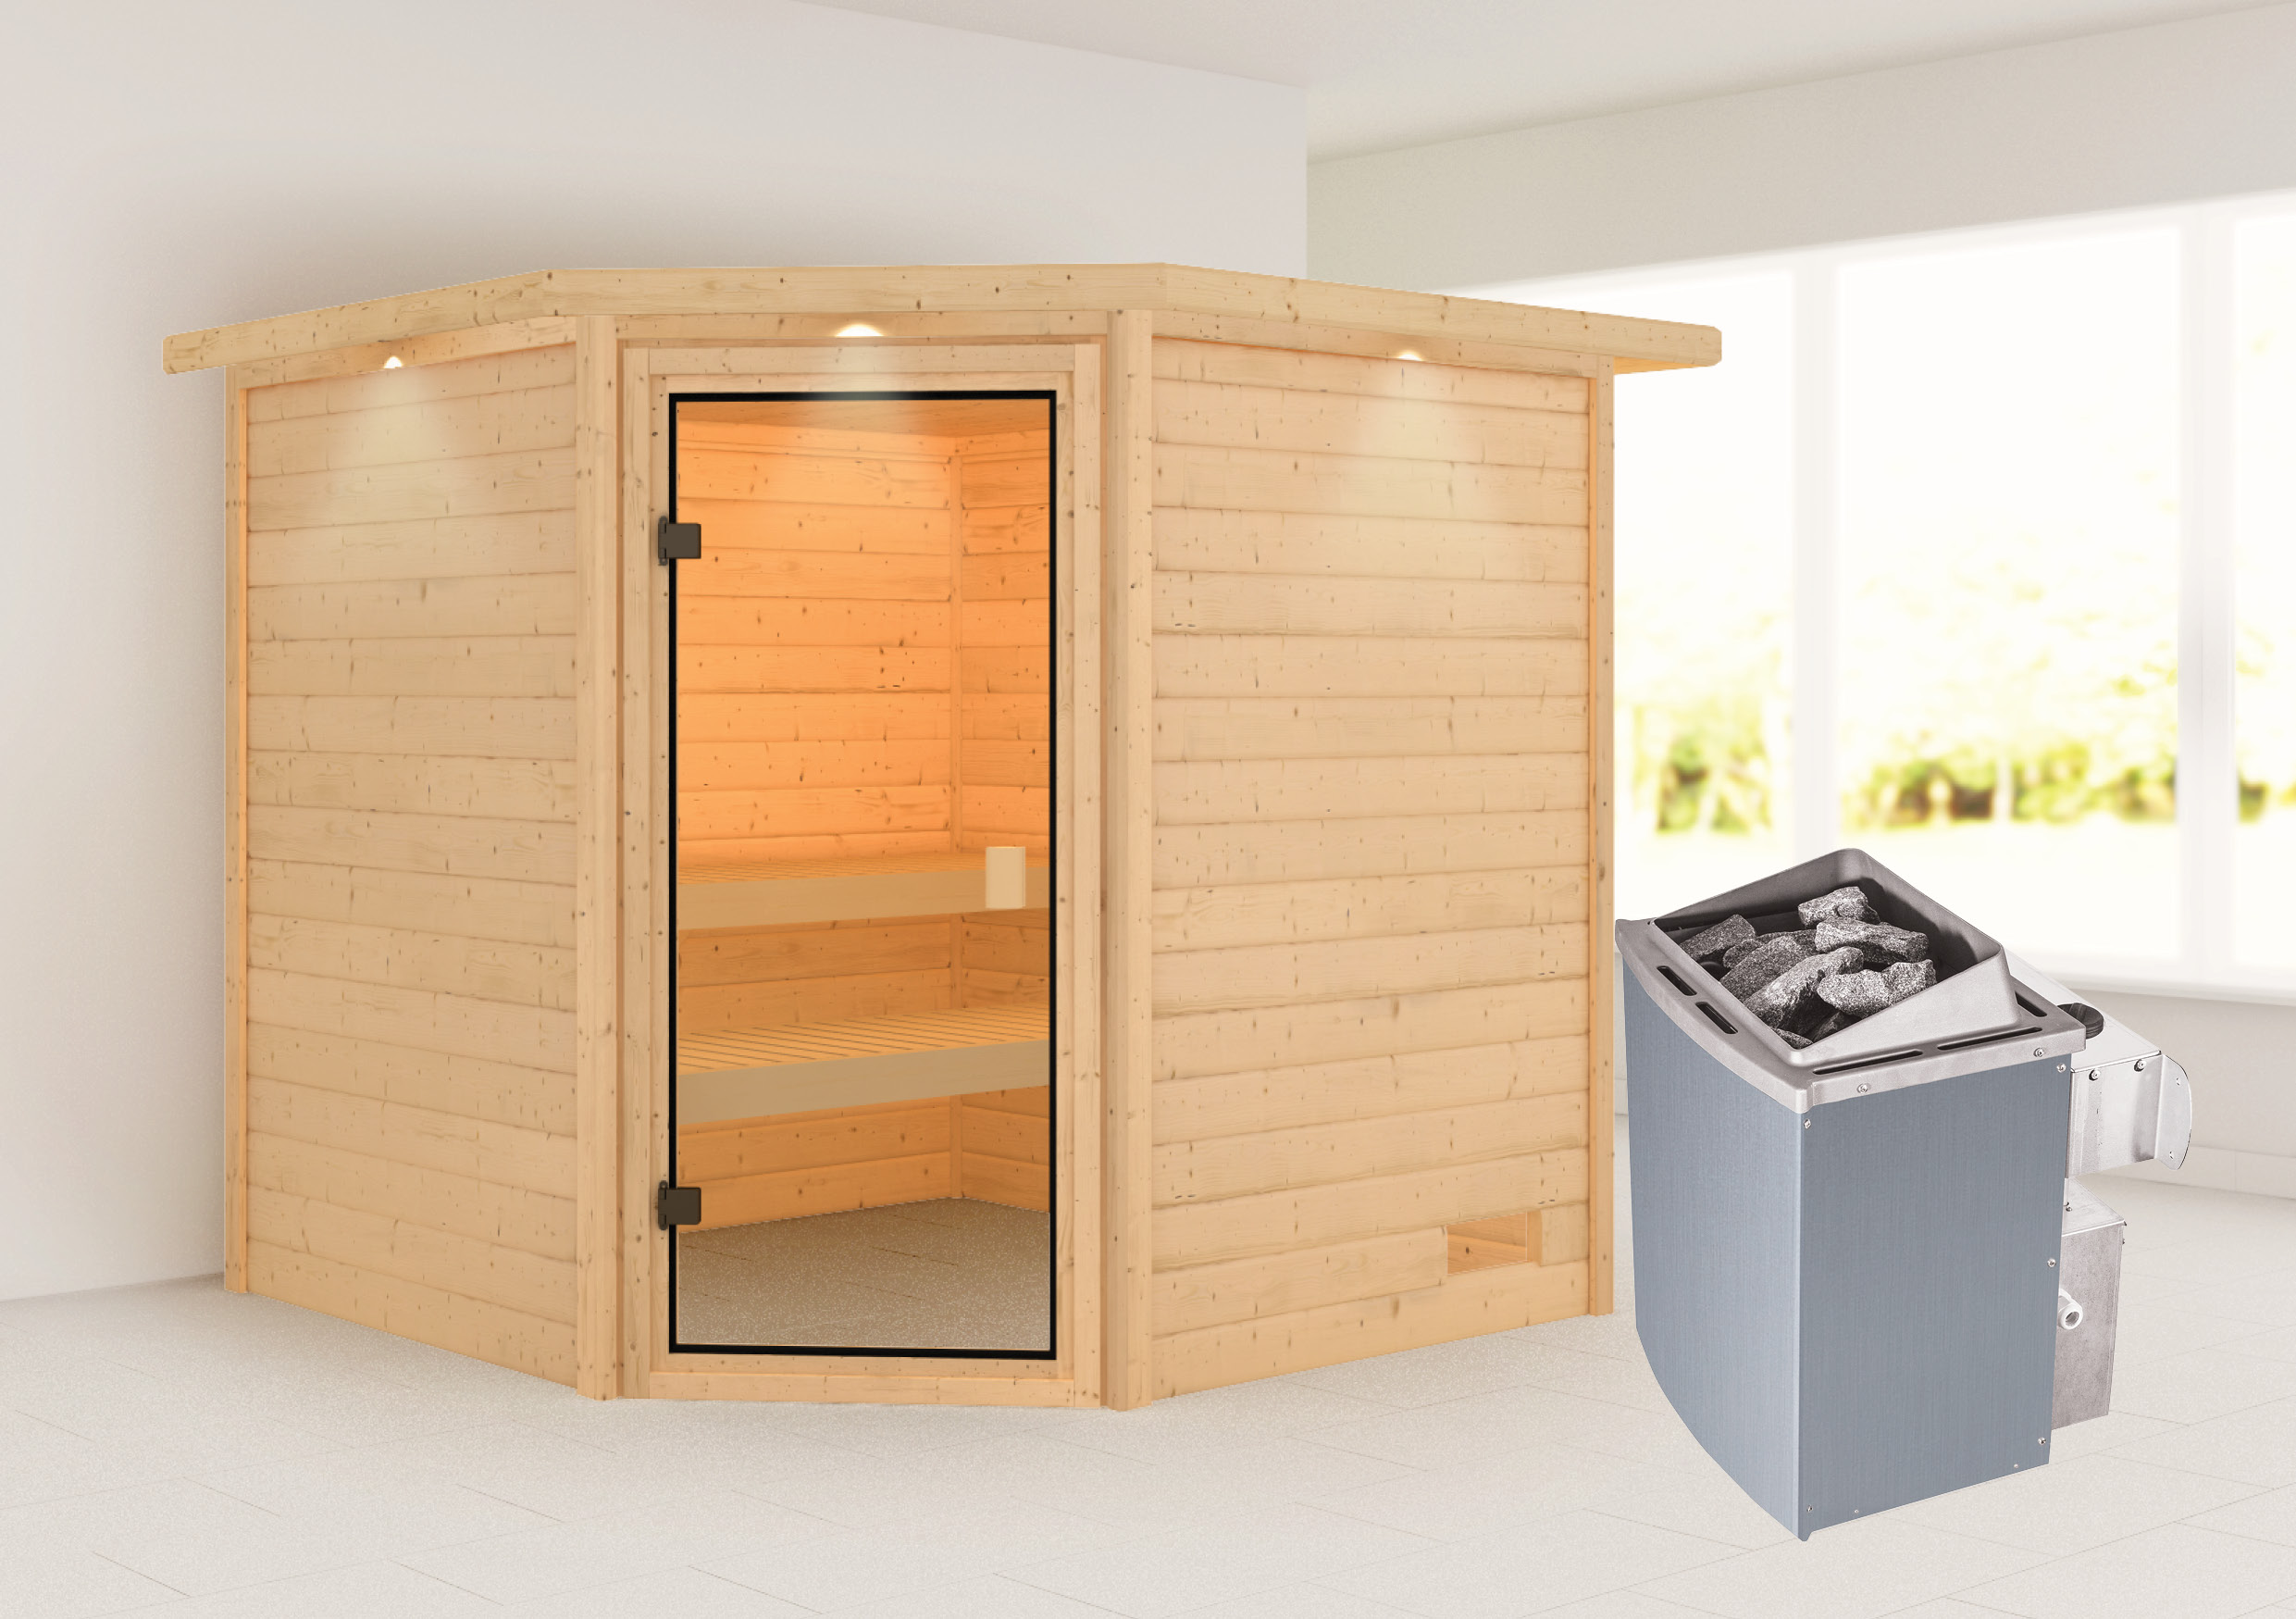 Woodfeeling Sauna Tilda 38mm Dachkranz Saunaofen 9kW intern Bild 1